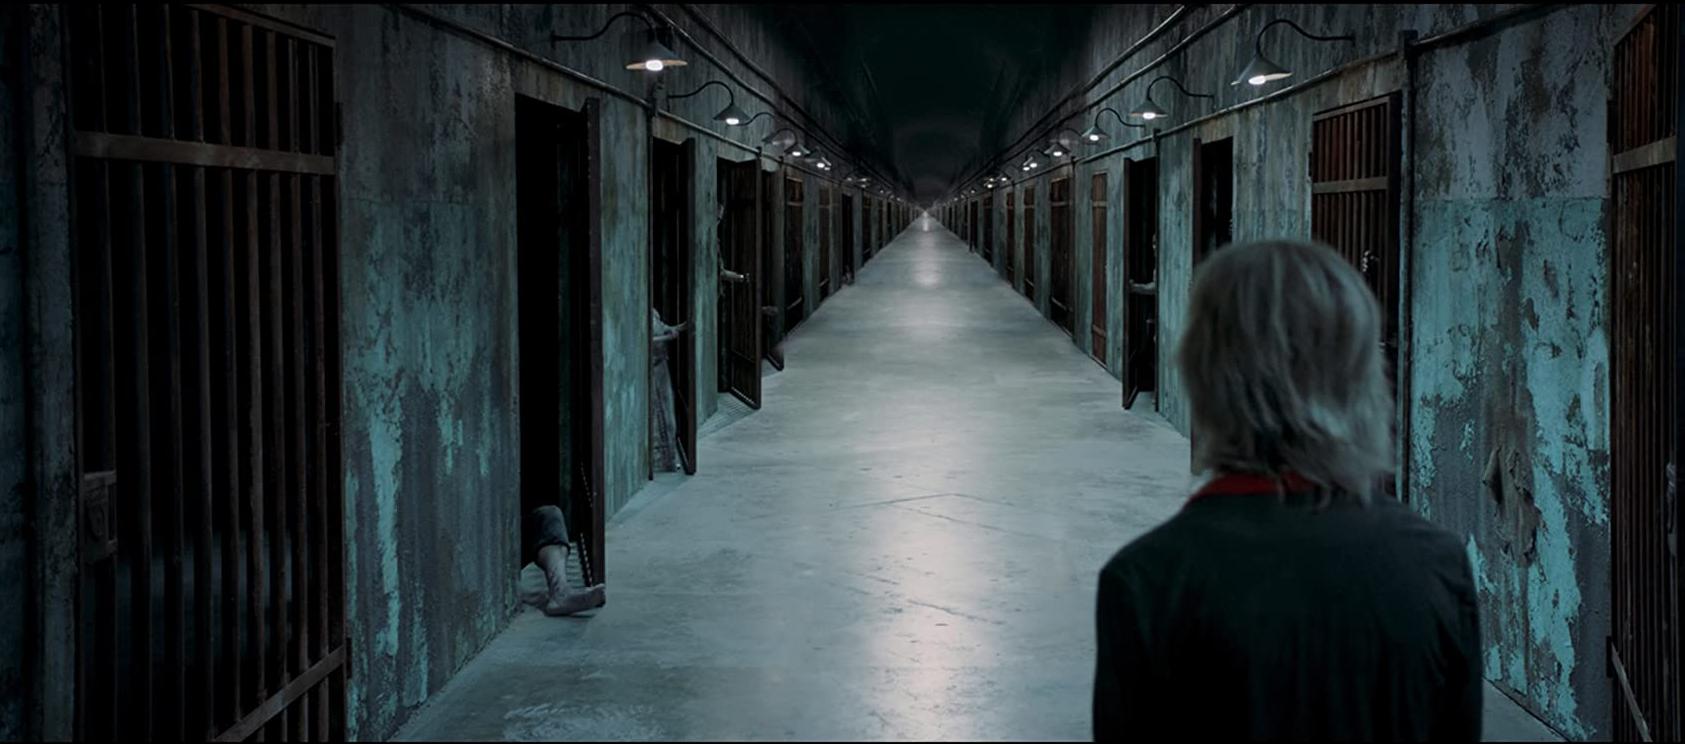 insidious 4_ the hallway.PNG